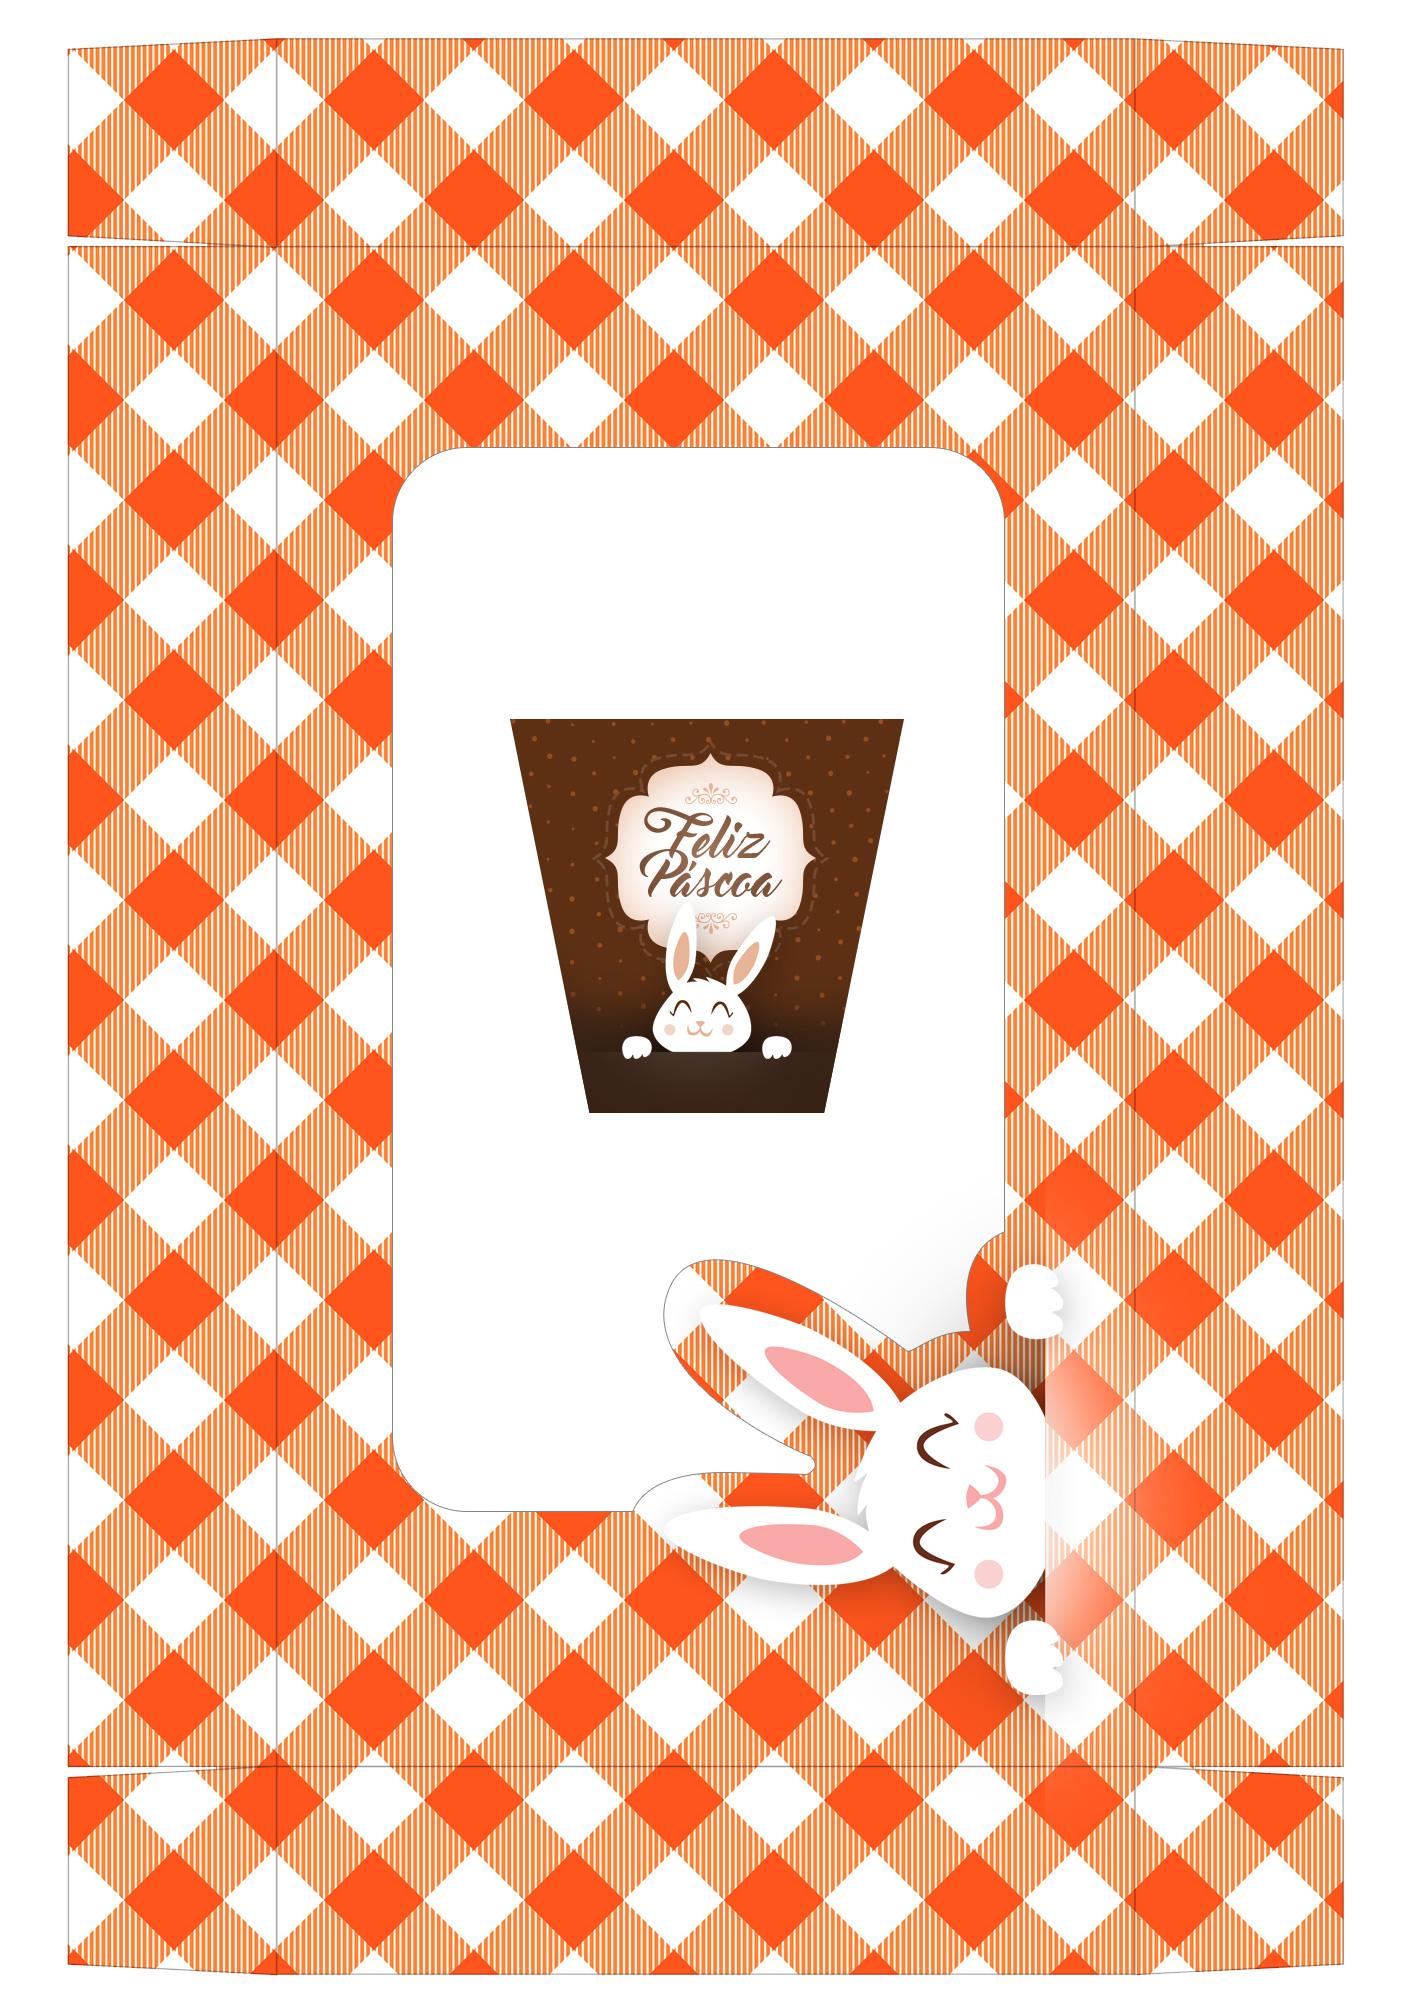 Caixa Kit Confeiteiro para Páscoa 15 - parte de cima